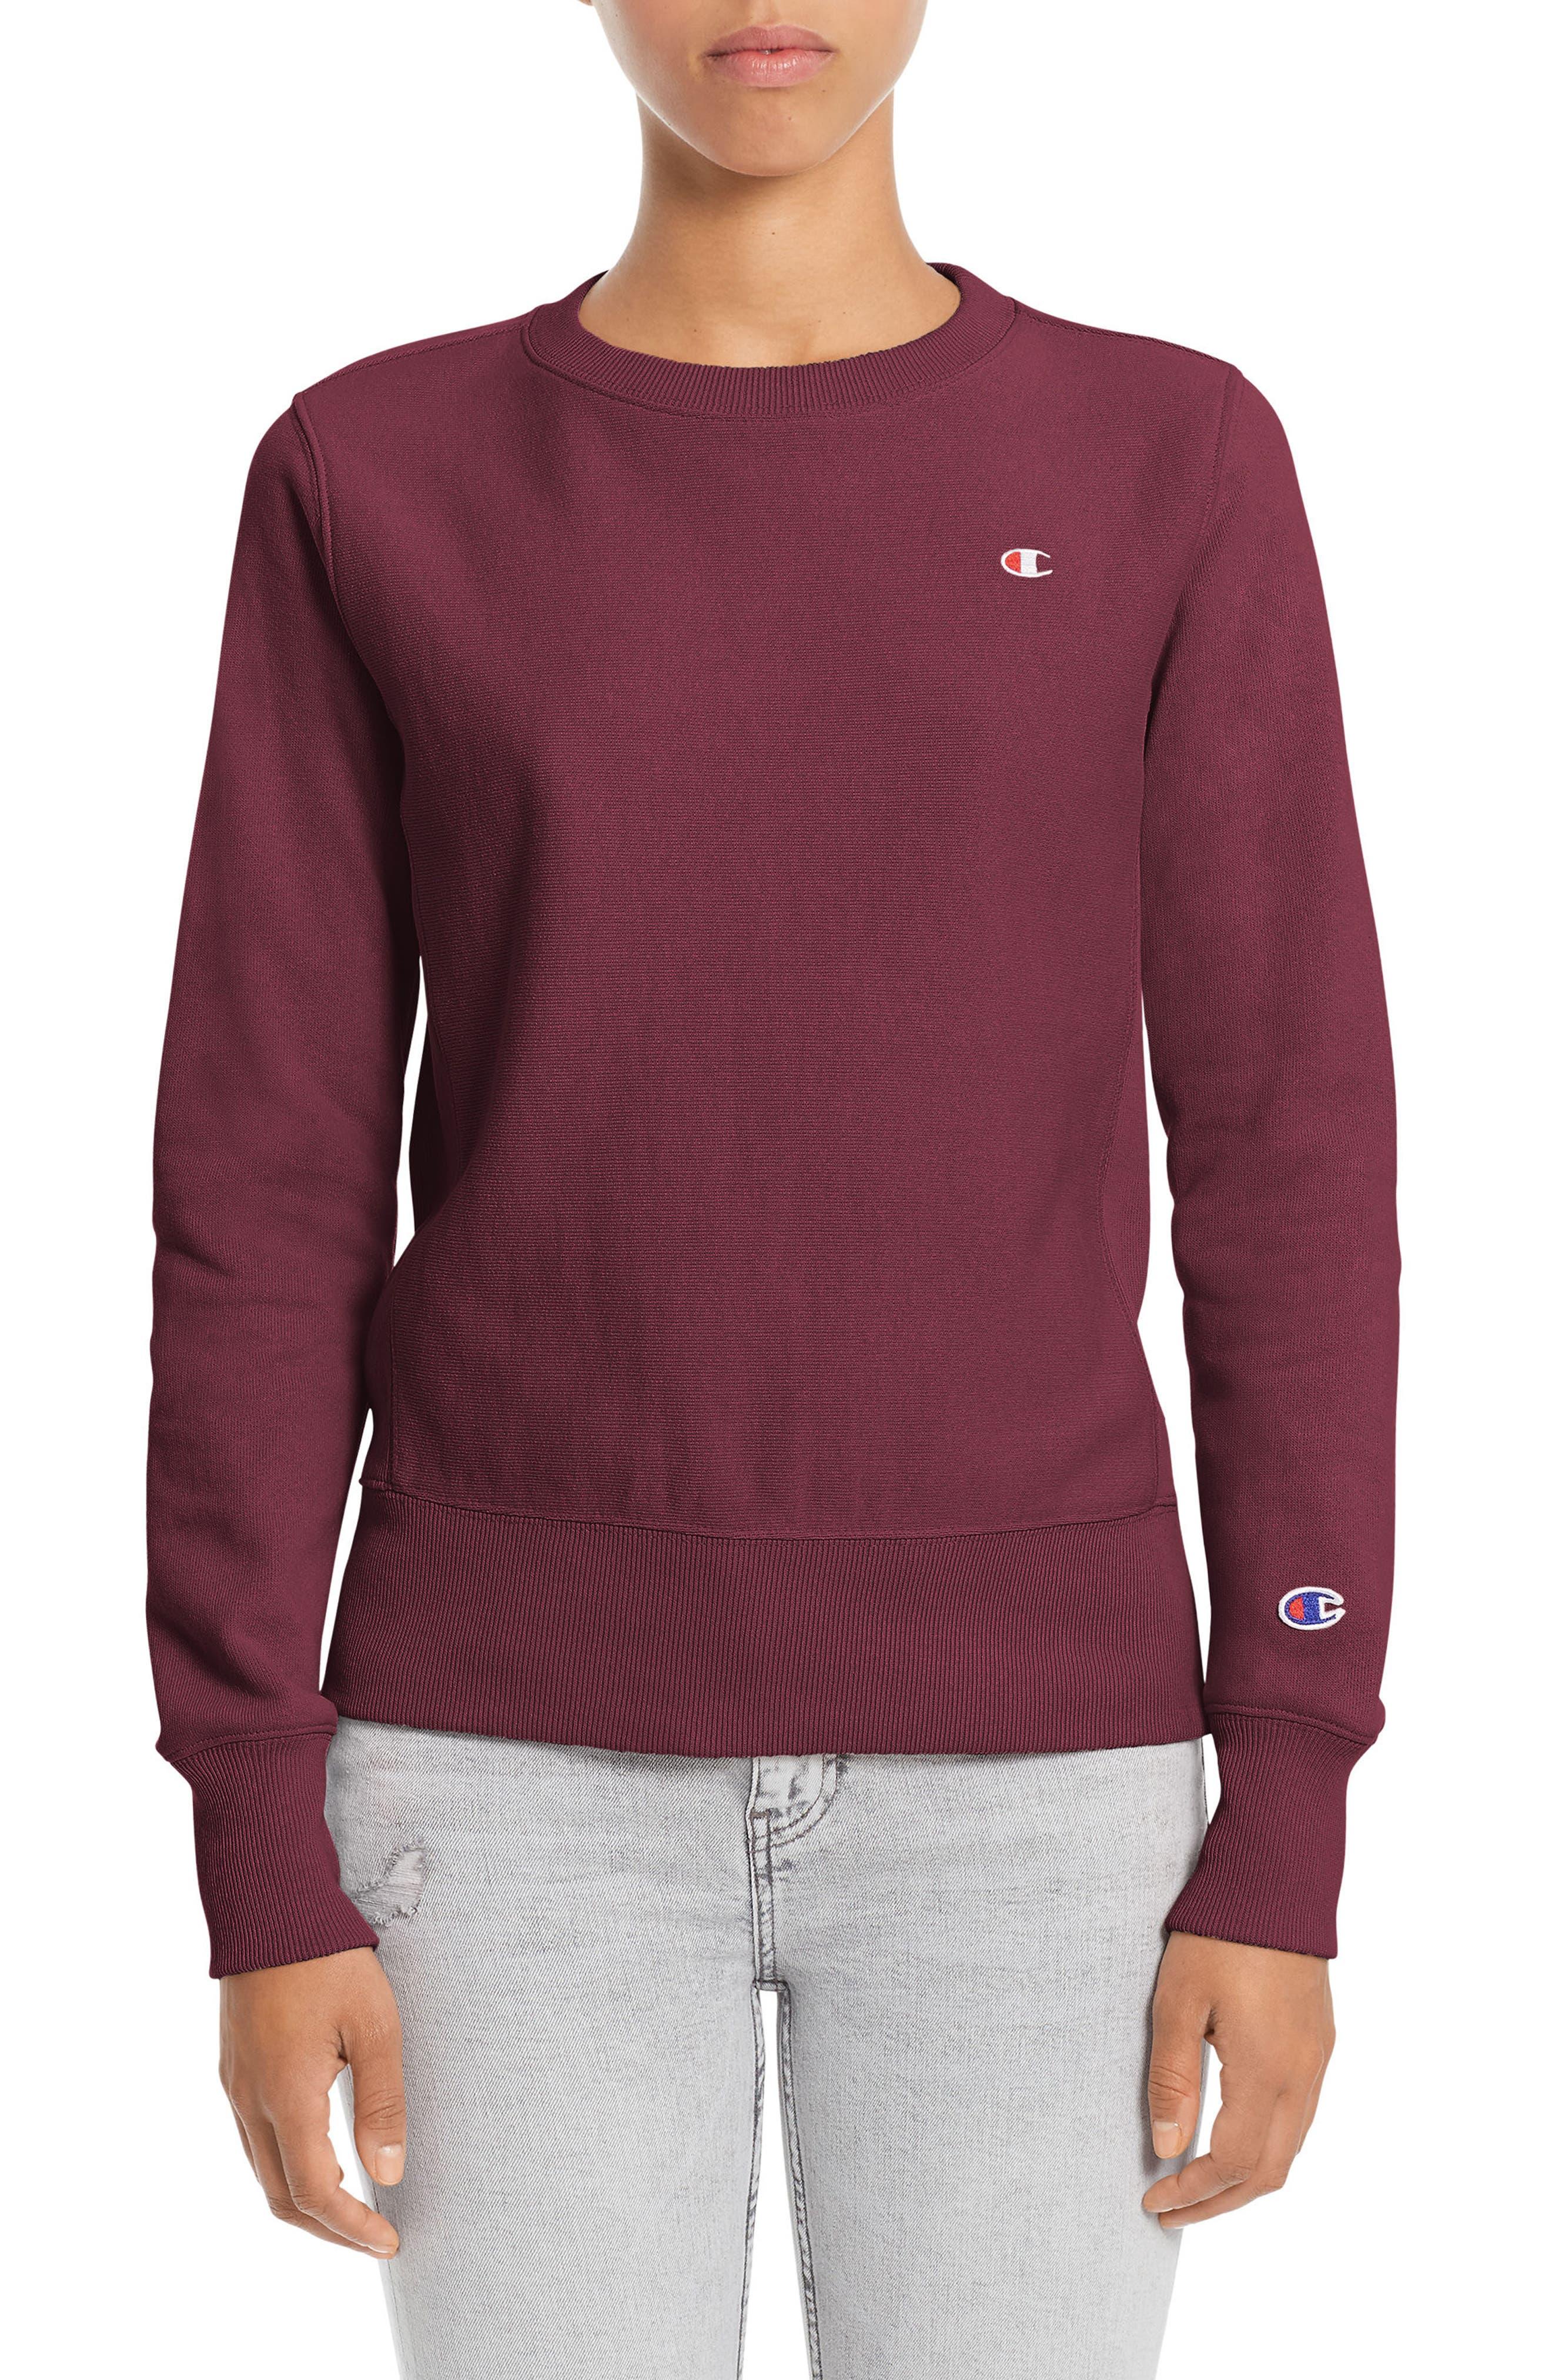 Reverse Weave<sup>®</sup> French Terry Crewneck Sweatshirt,                             Main thumbnail 1, color,                             Bordeaux Red